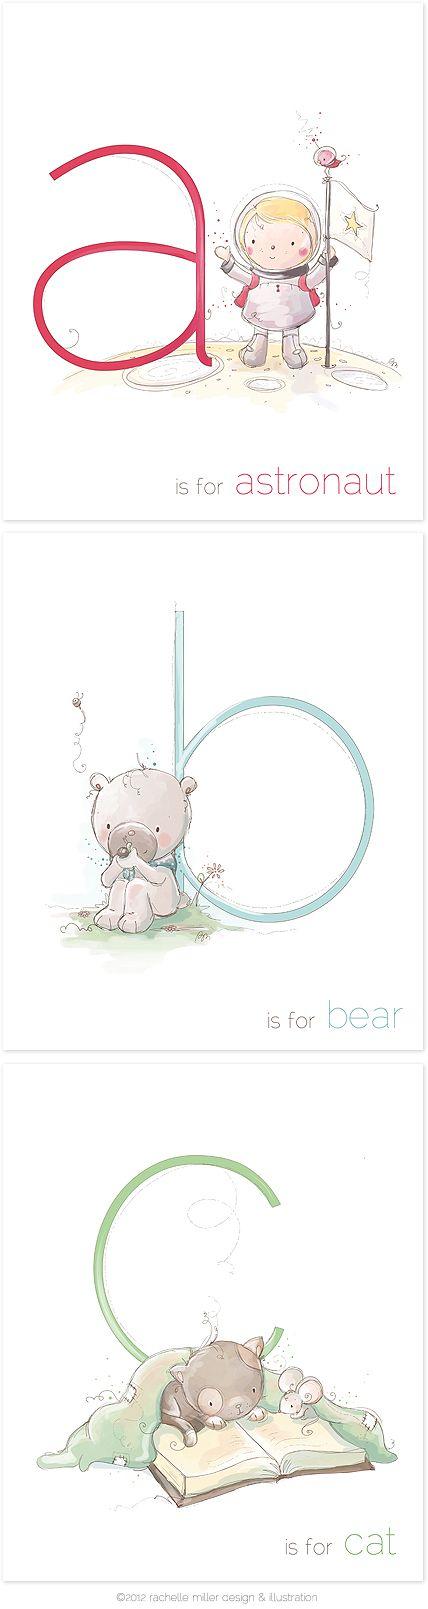 Alphabet Prints for Kids by Rachelle Anne Miller